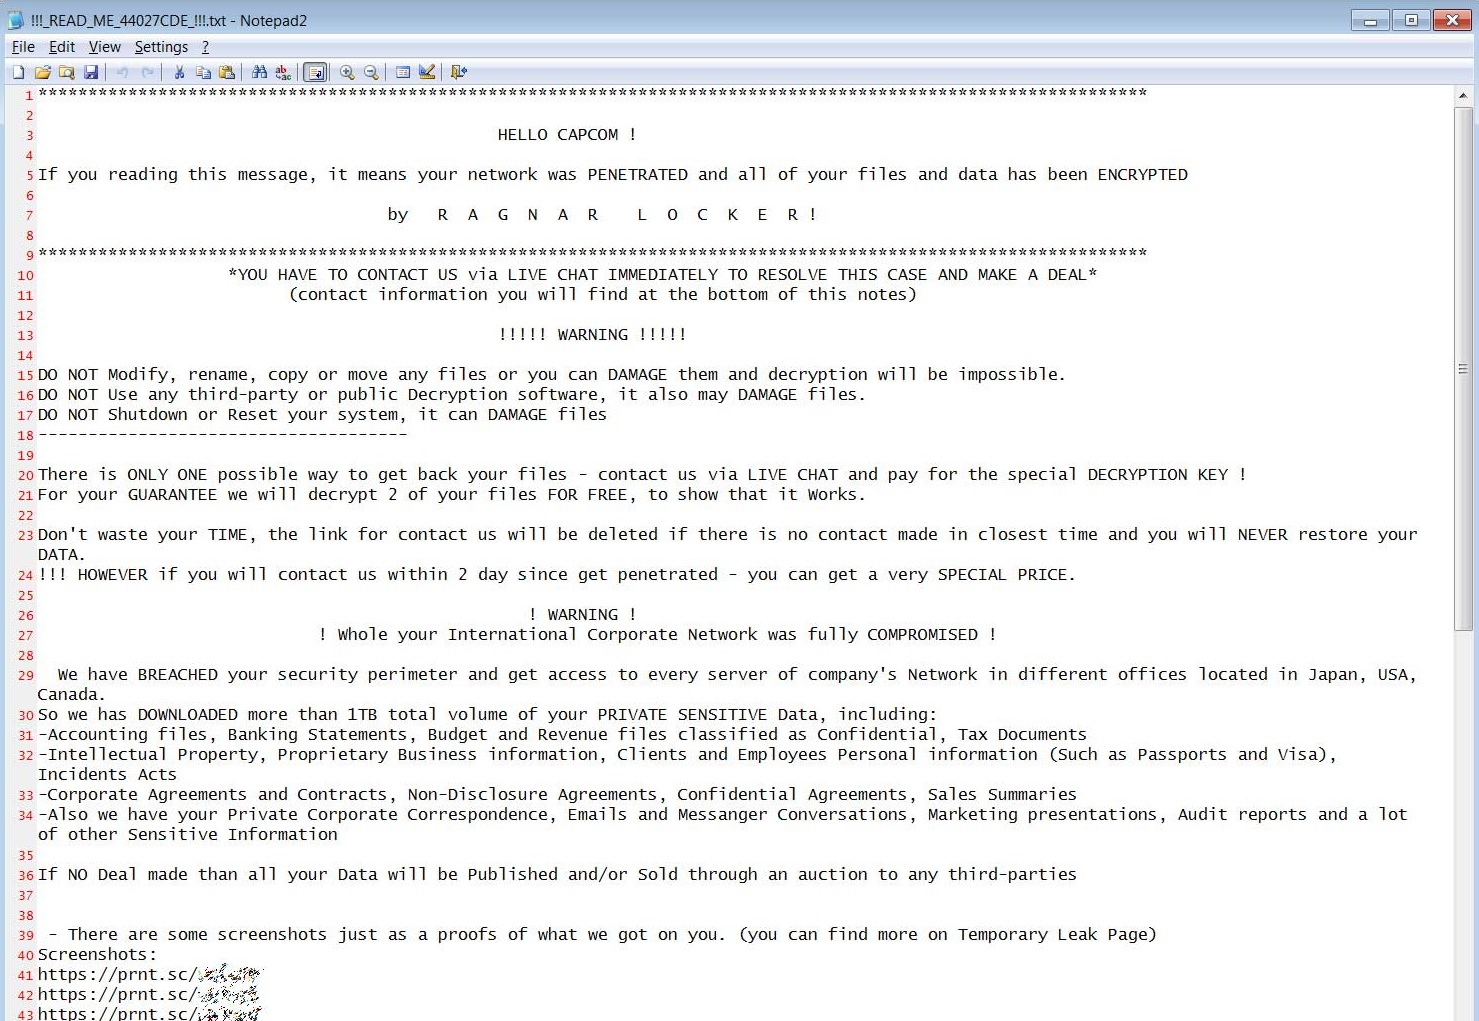 capcom ragnar ransomware